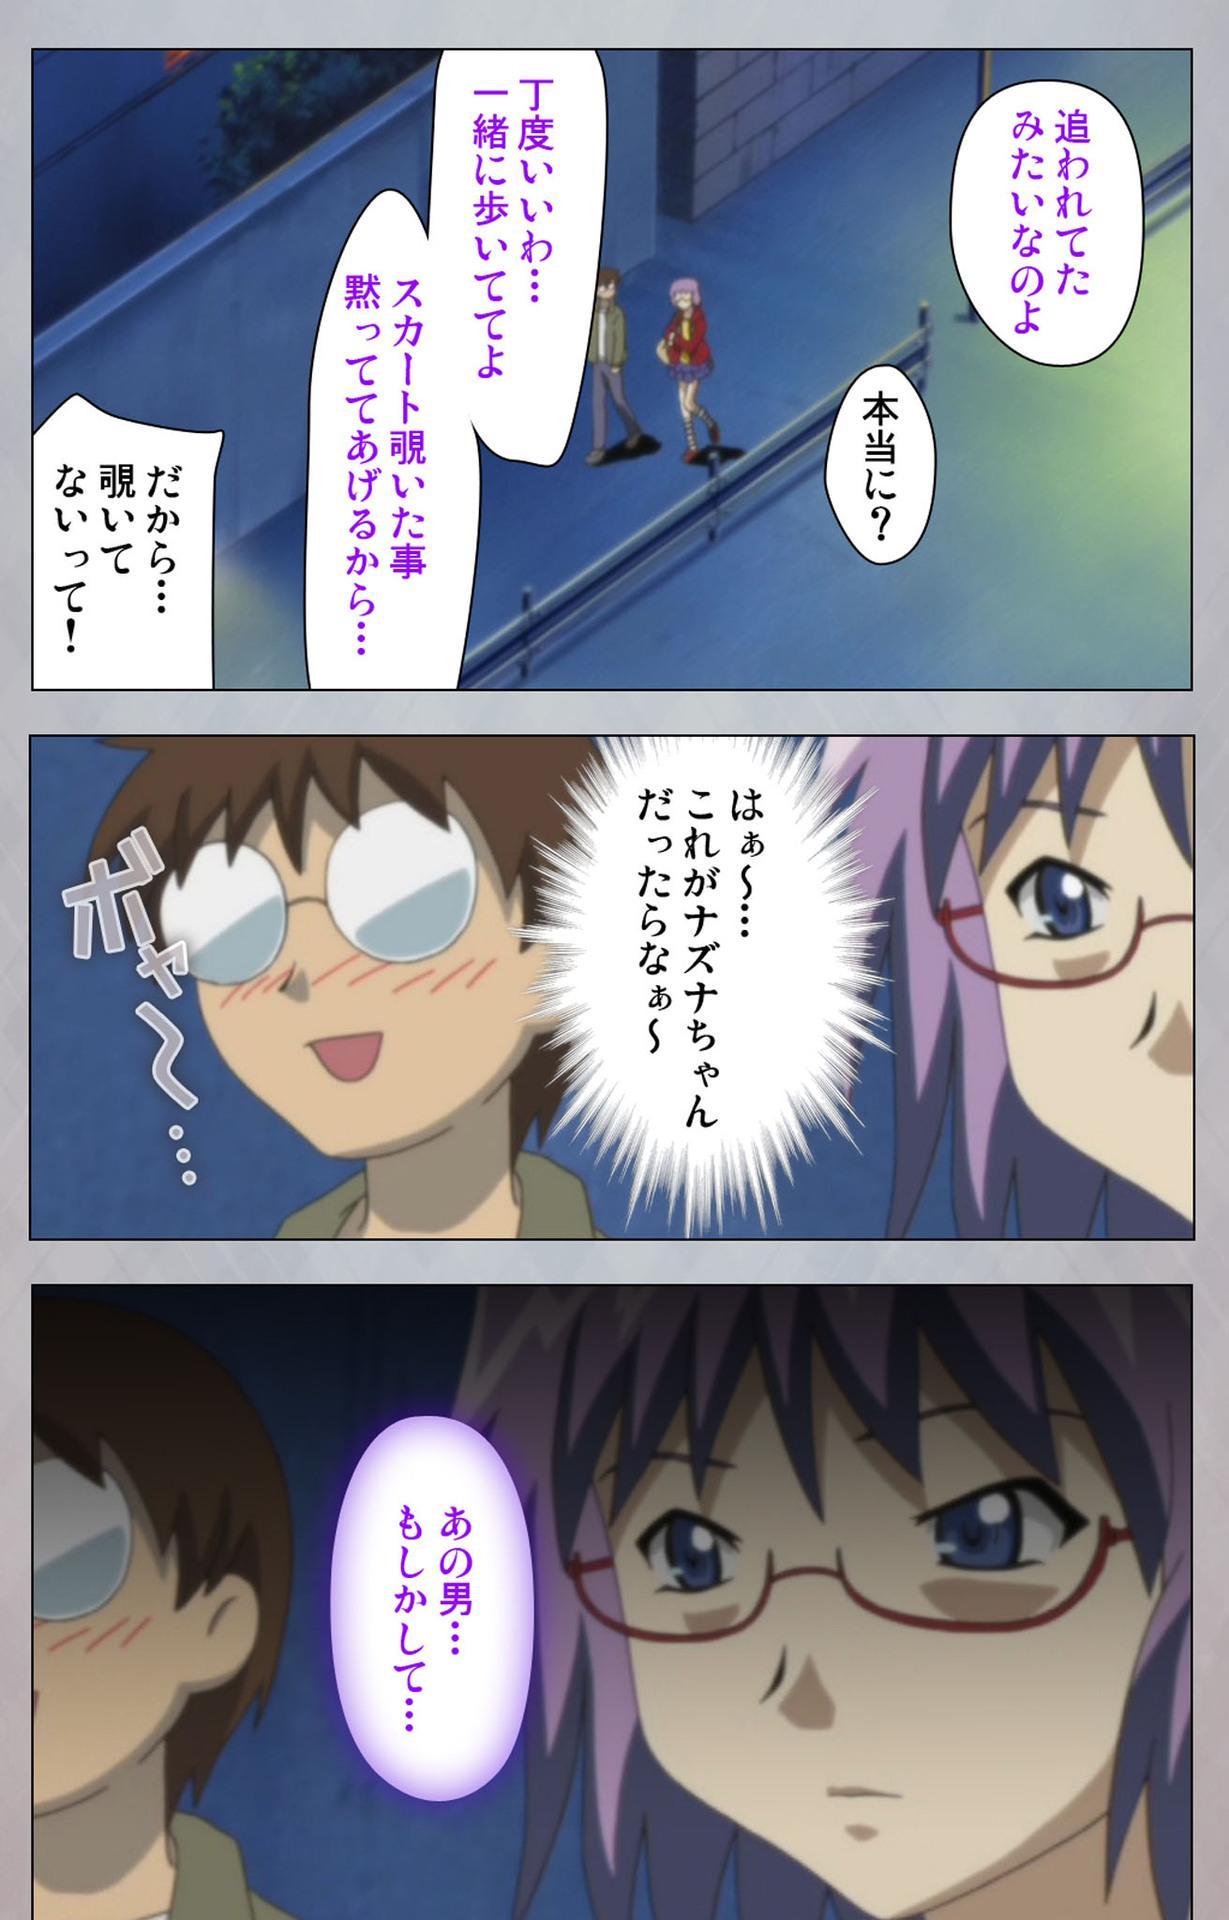 [Digital Works] [Full Color Seijin Ban] Sex Android ~Risou no Onna de Nuite yaru~ Kanzenban 25